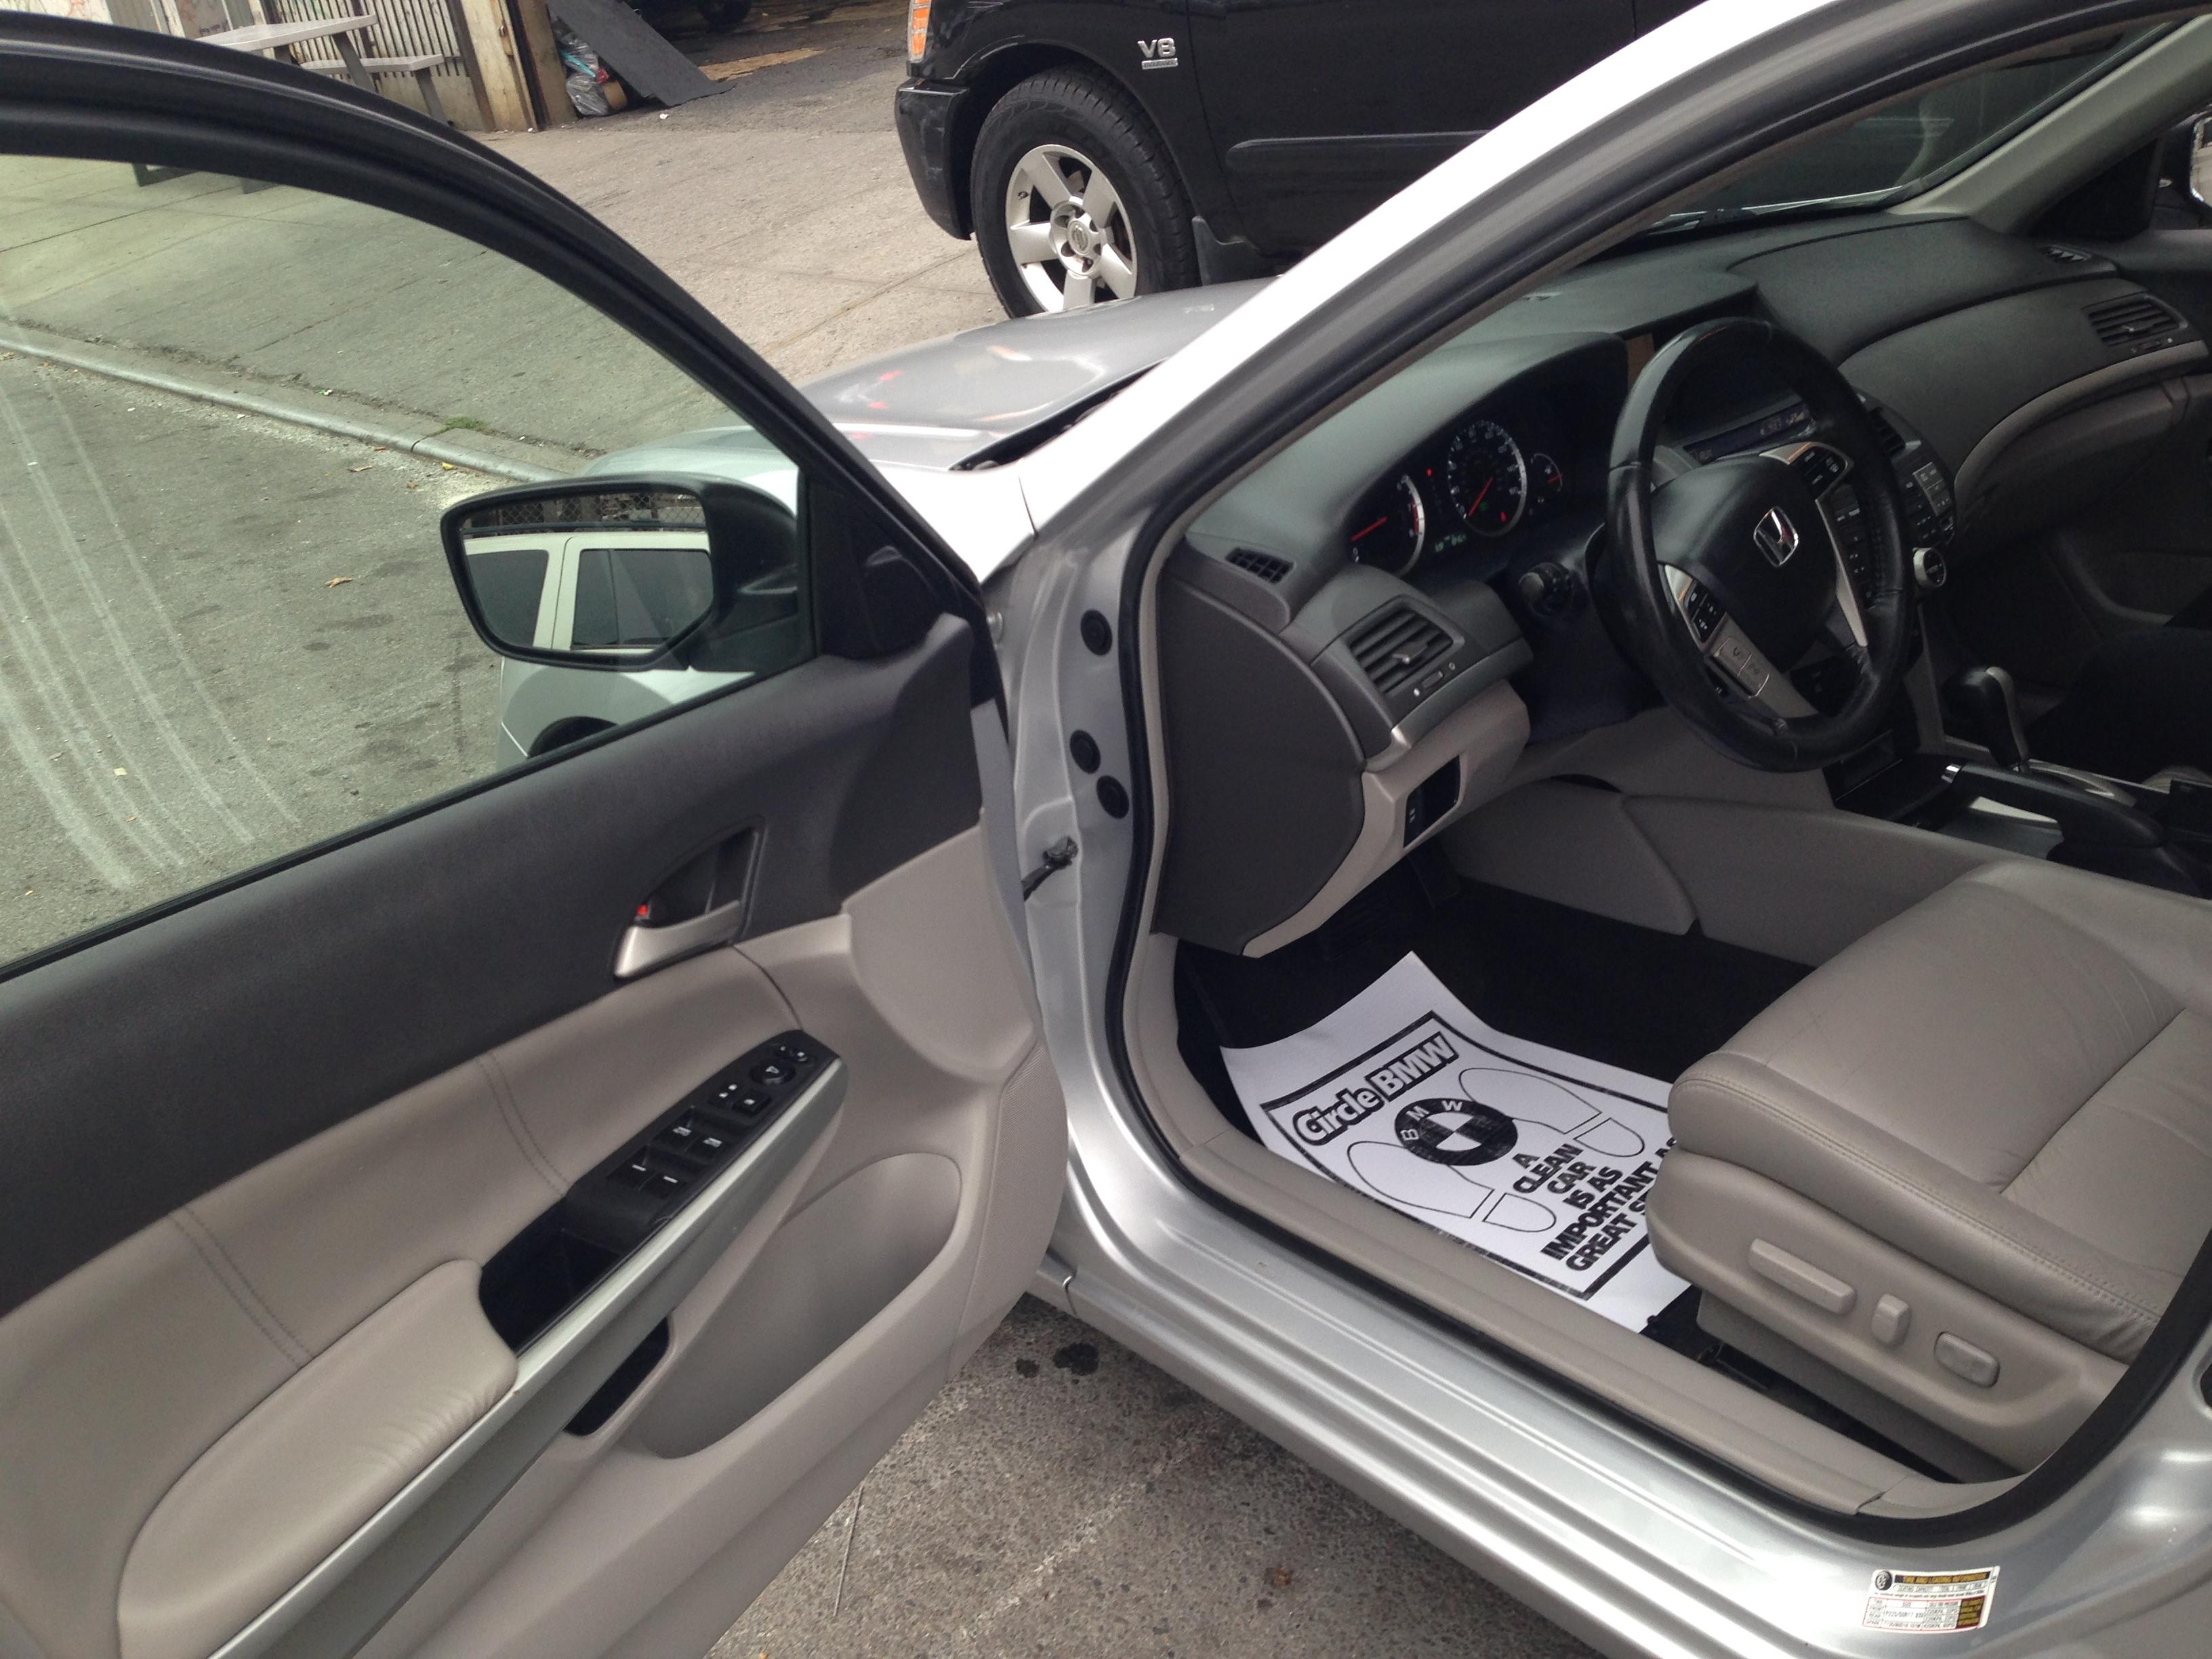 2008 Accord EXL V6 Navigation